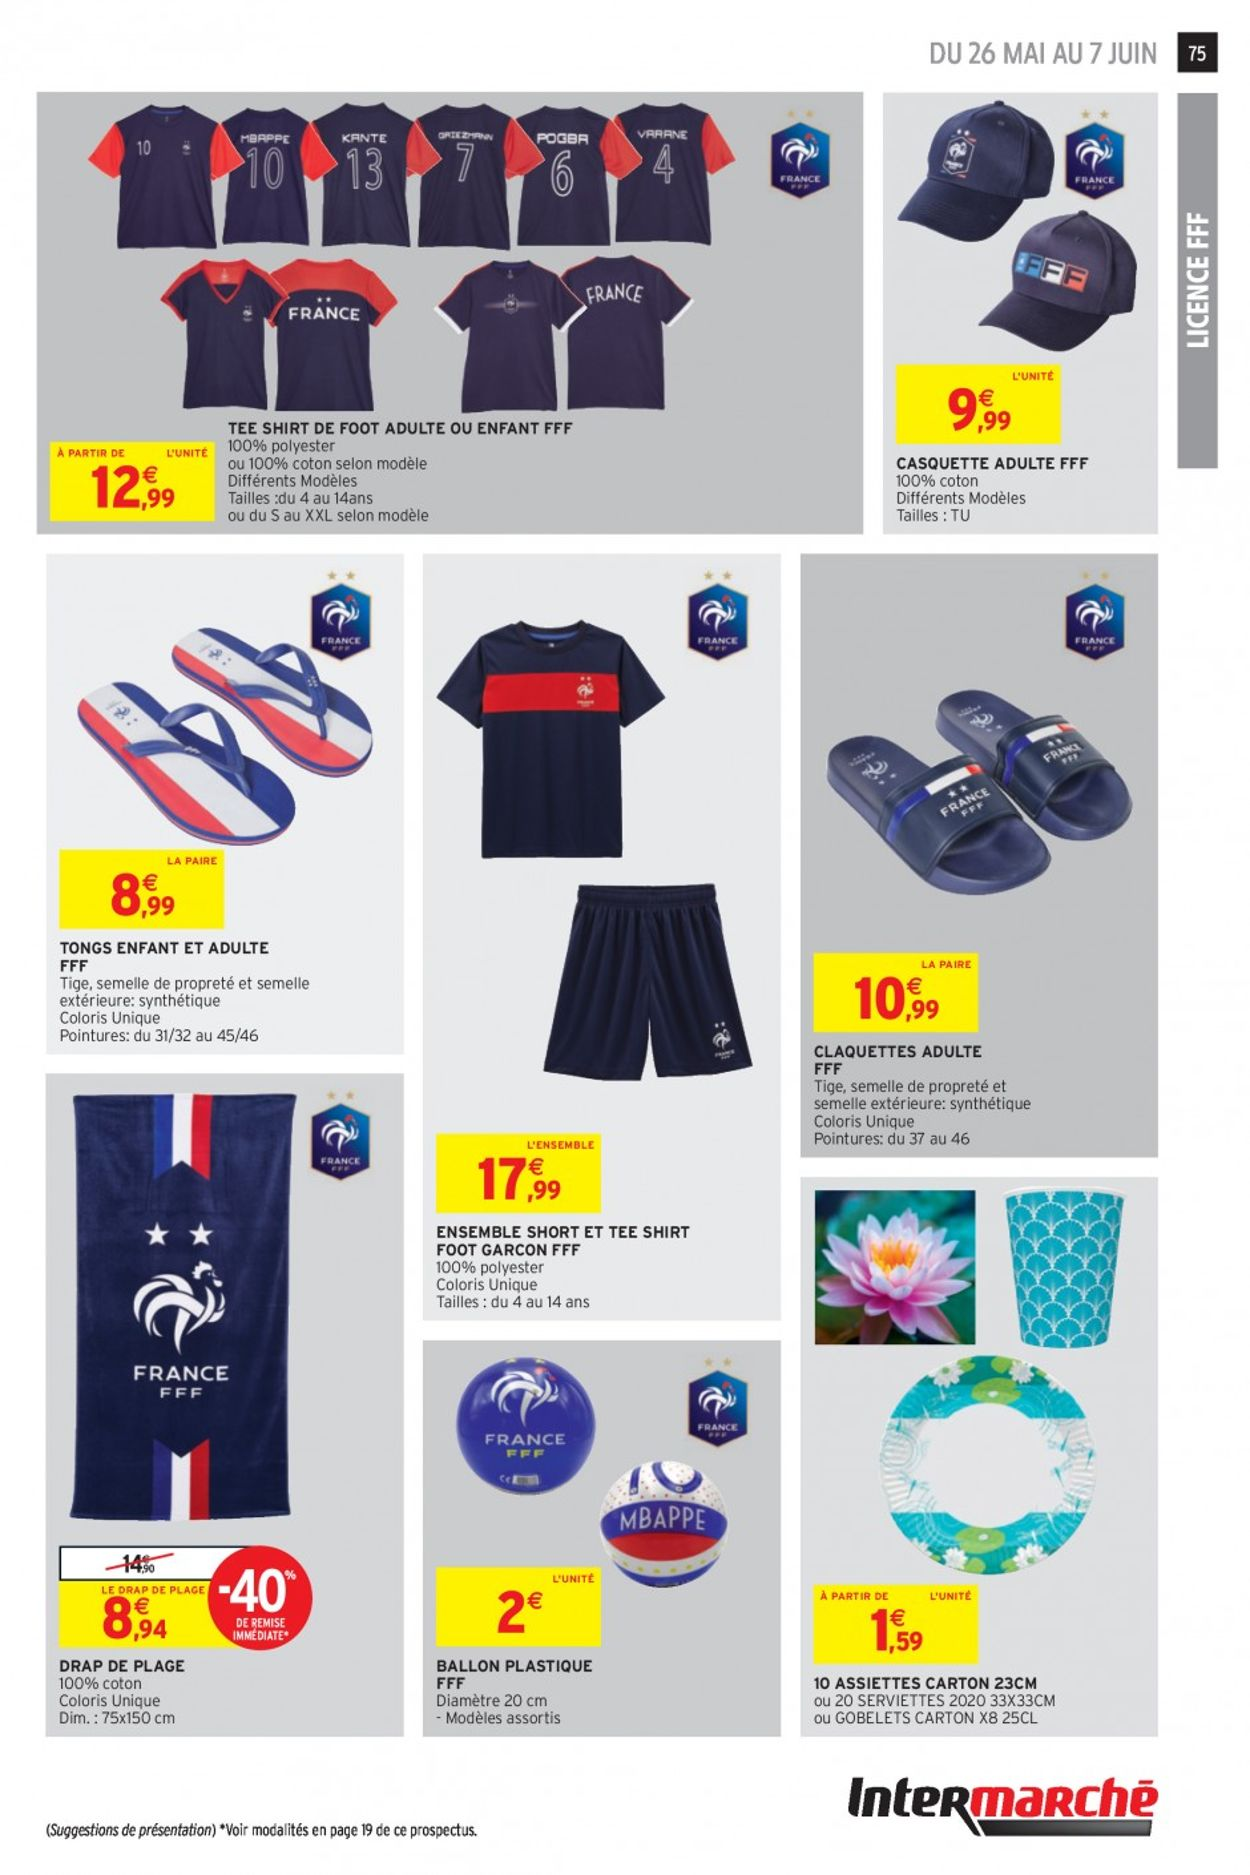 Intermarché Catalogue - 26.05-07.06.2020 (Page 72)